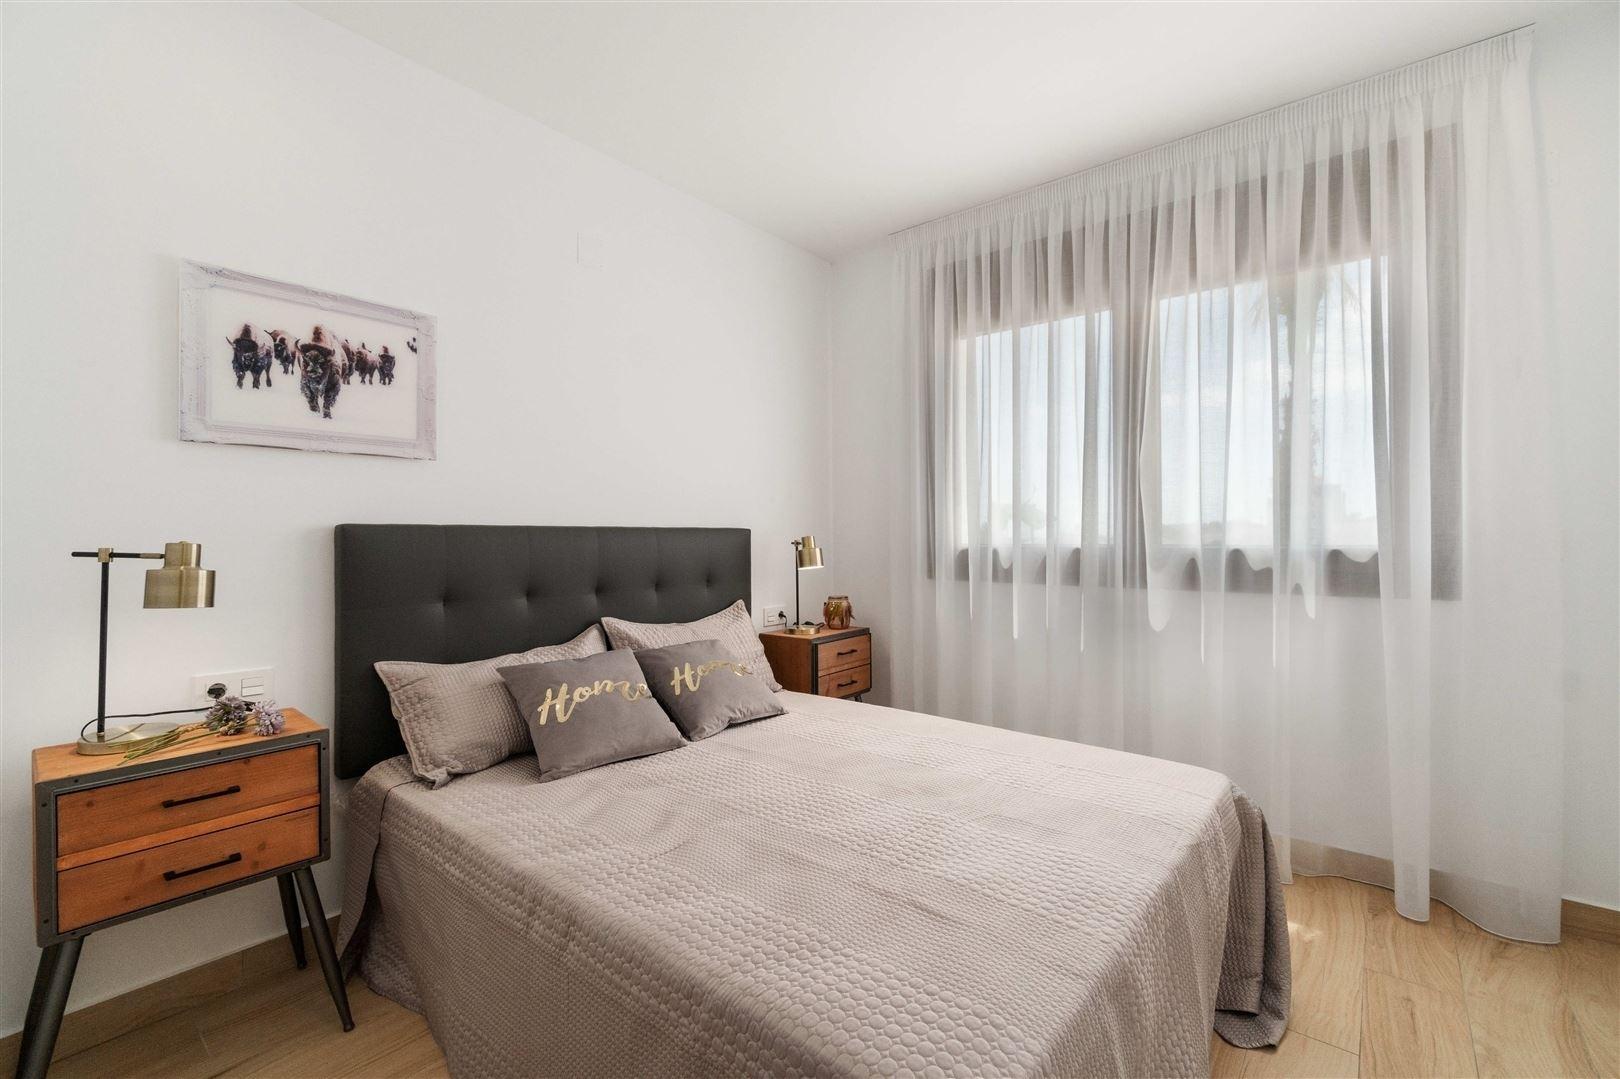 Foto 7 : Appartement te   (Spanje) - Prijs € 169.900